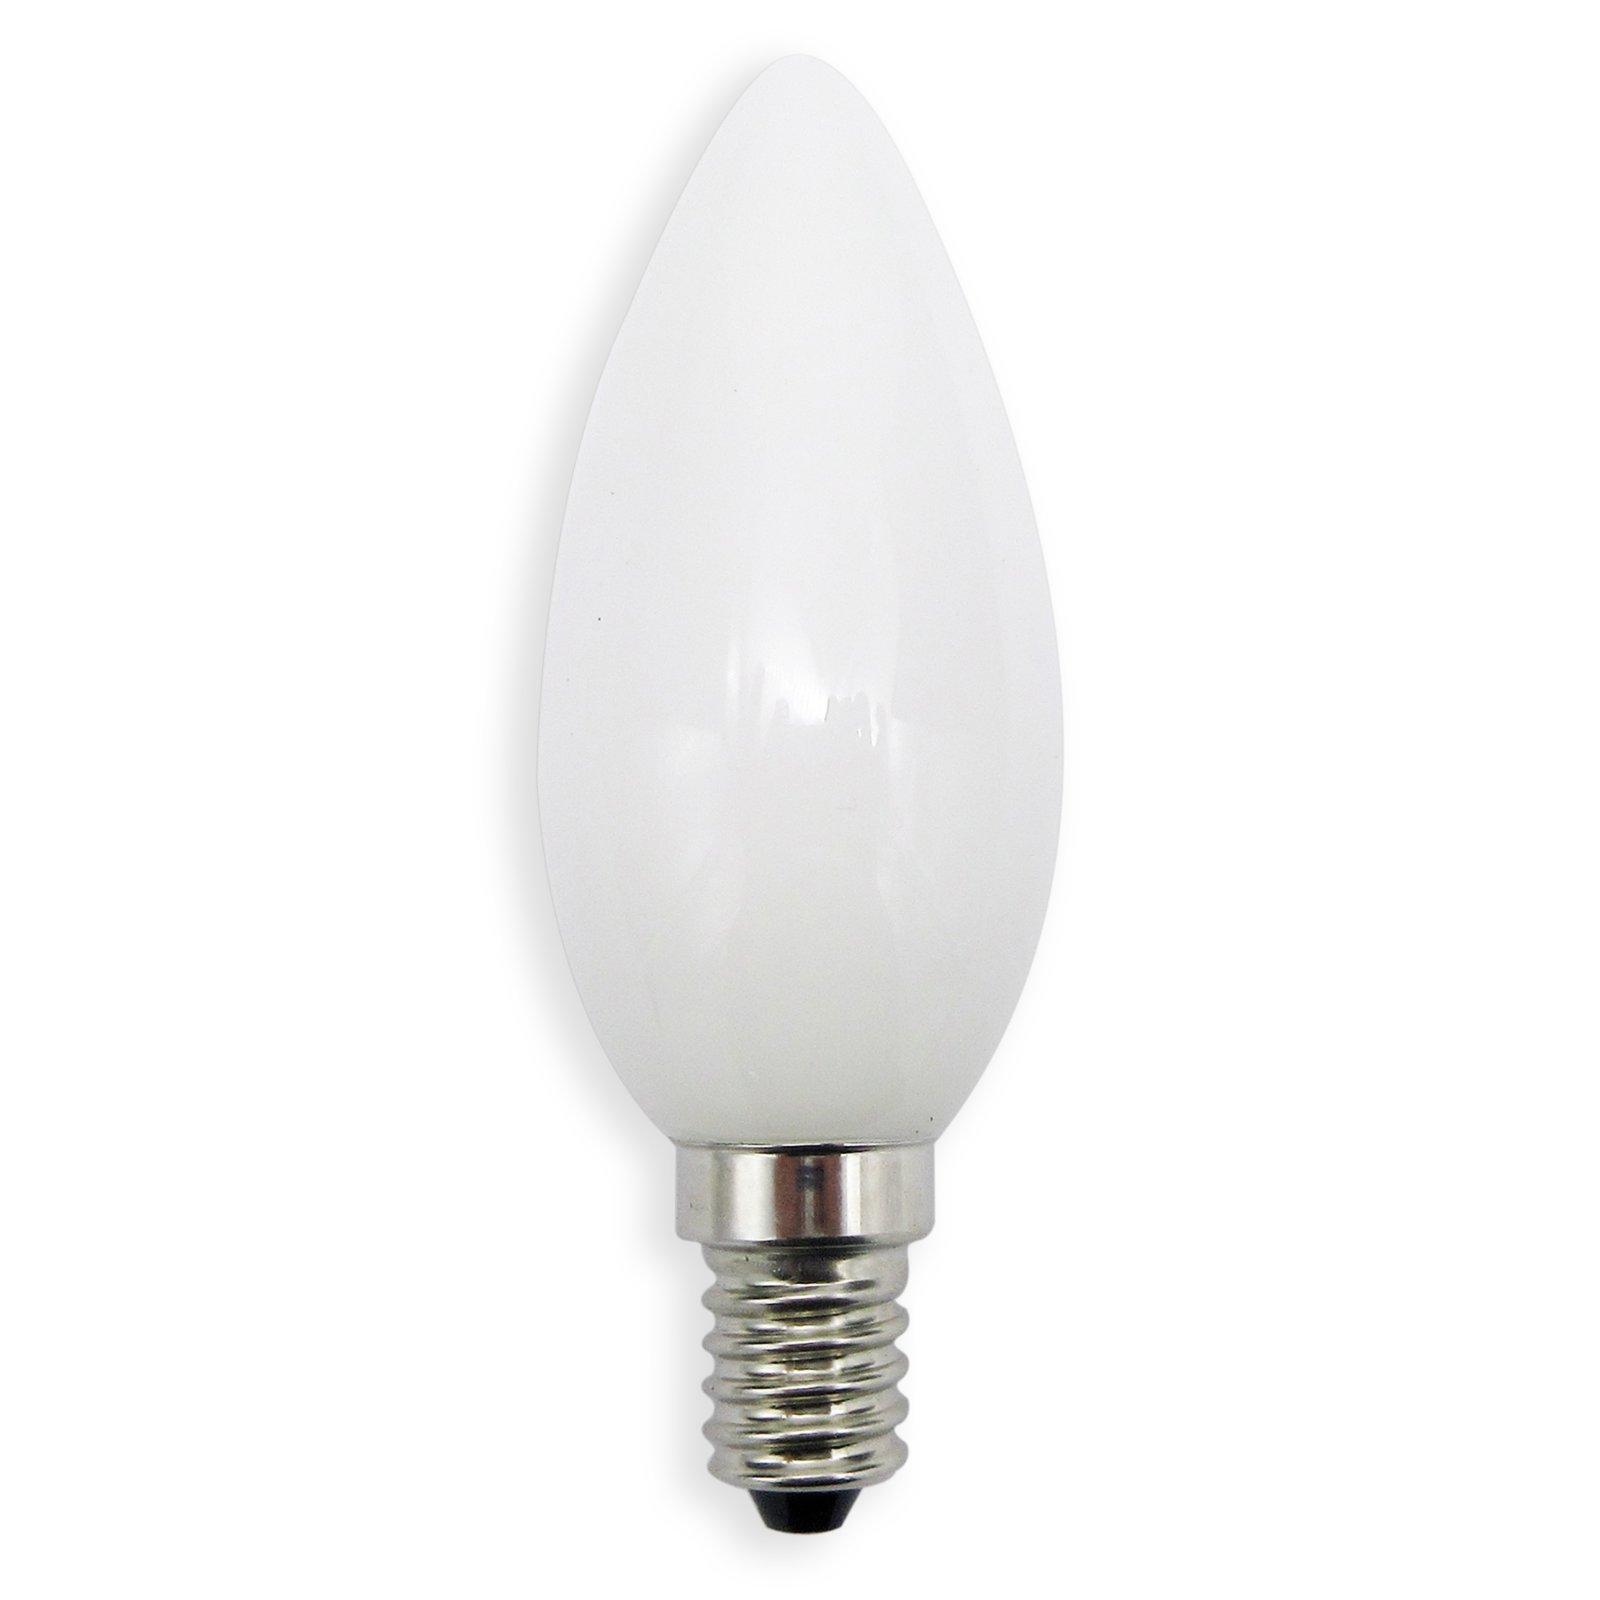 led kerzenlampe nostalgia lightime e14 3 5 w warmwei led leuchtmittel leuchtmittel. Black Bedroom Furniture Sets. Home Design Ideas